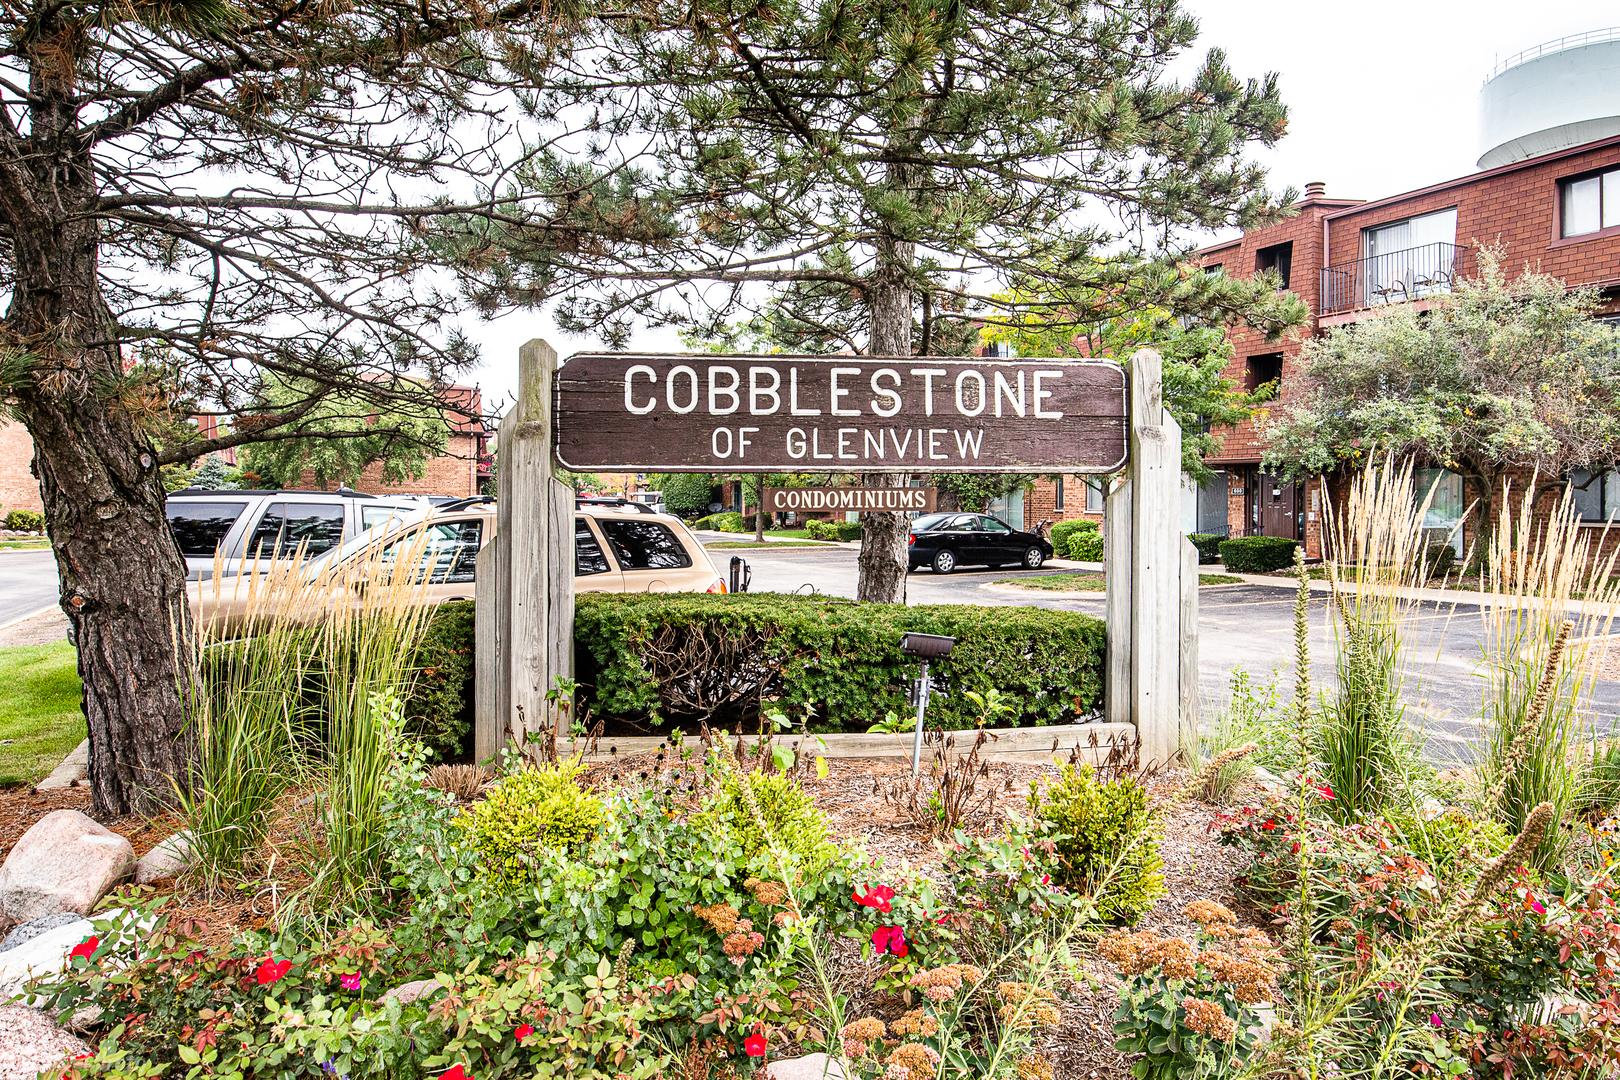 714 COBBLESTONE 2C, Glenview, Illinois, 60025